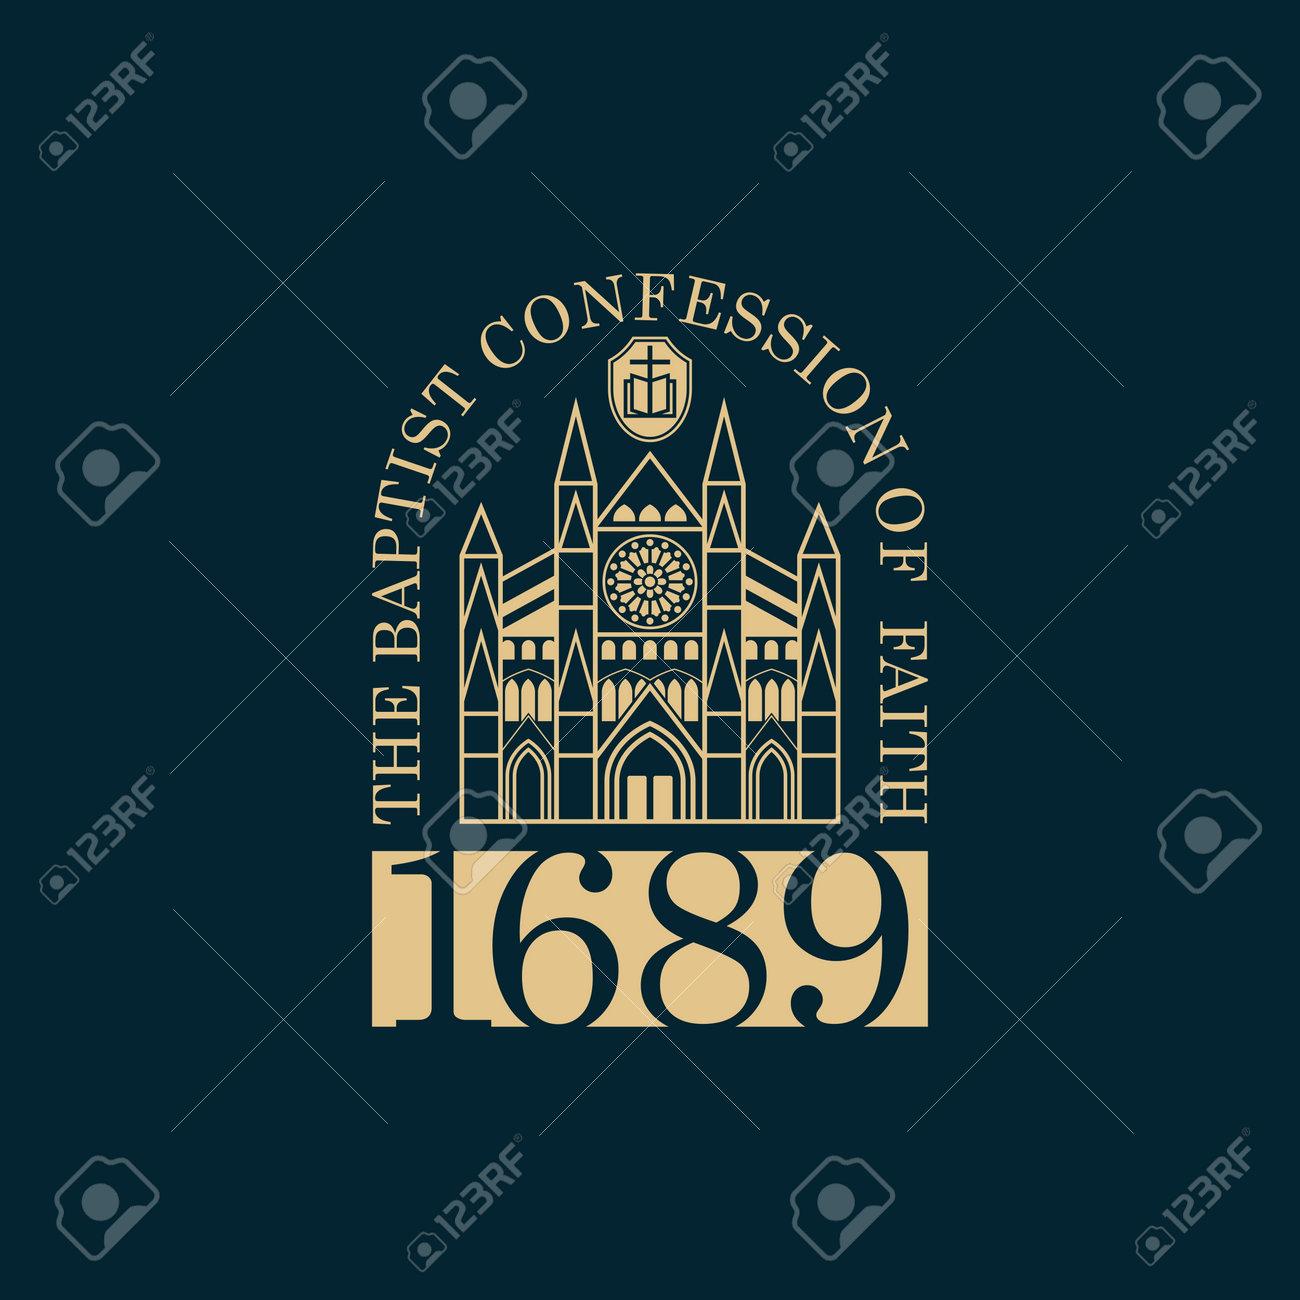 Reformed christian art. The 1689 Baptist Confession of Faith. - 166913170